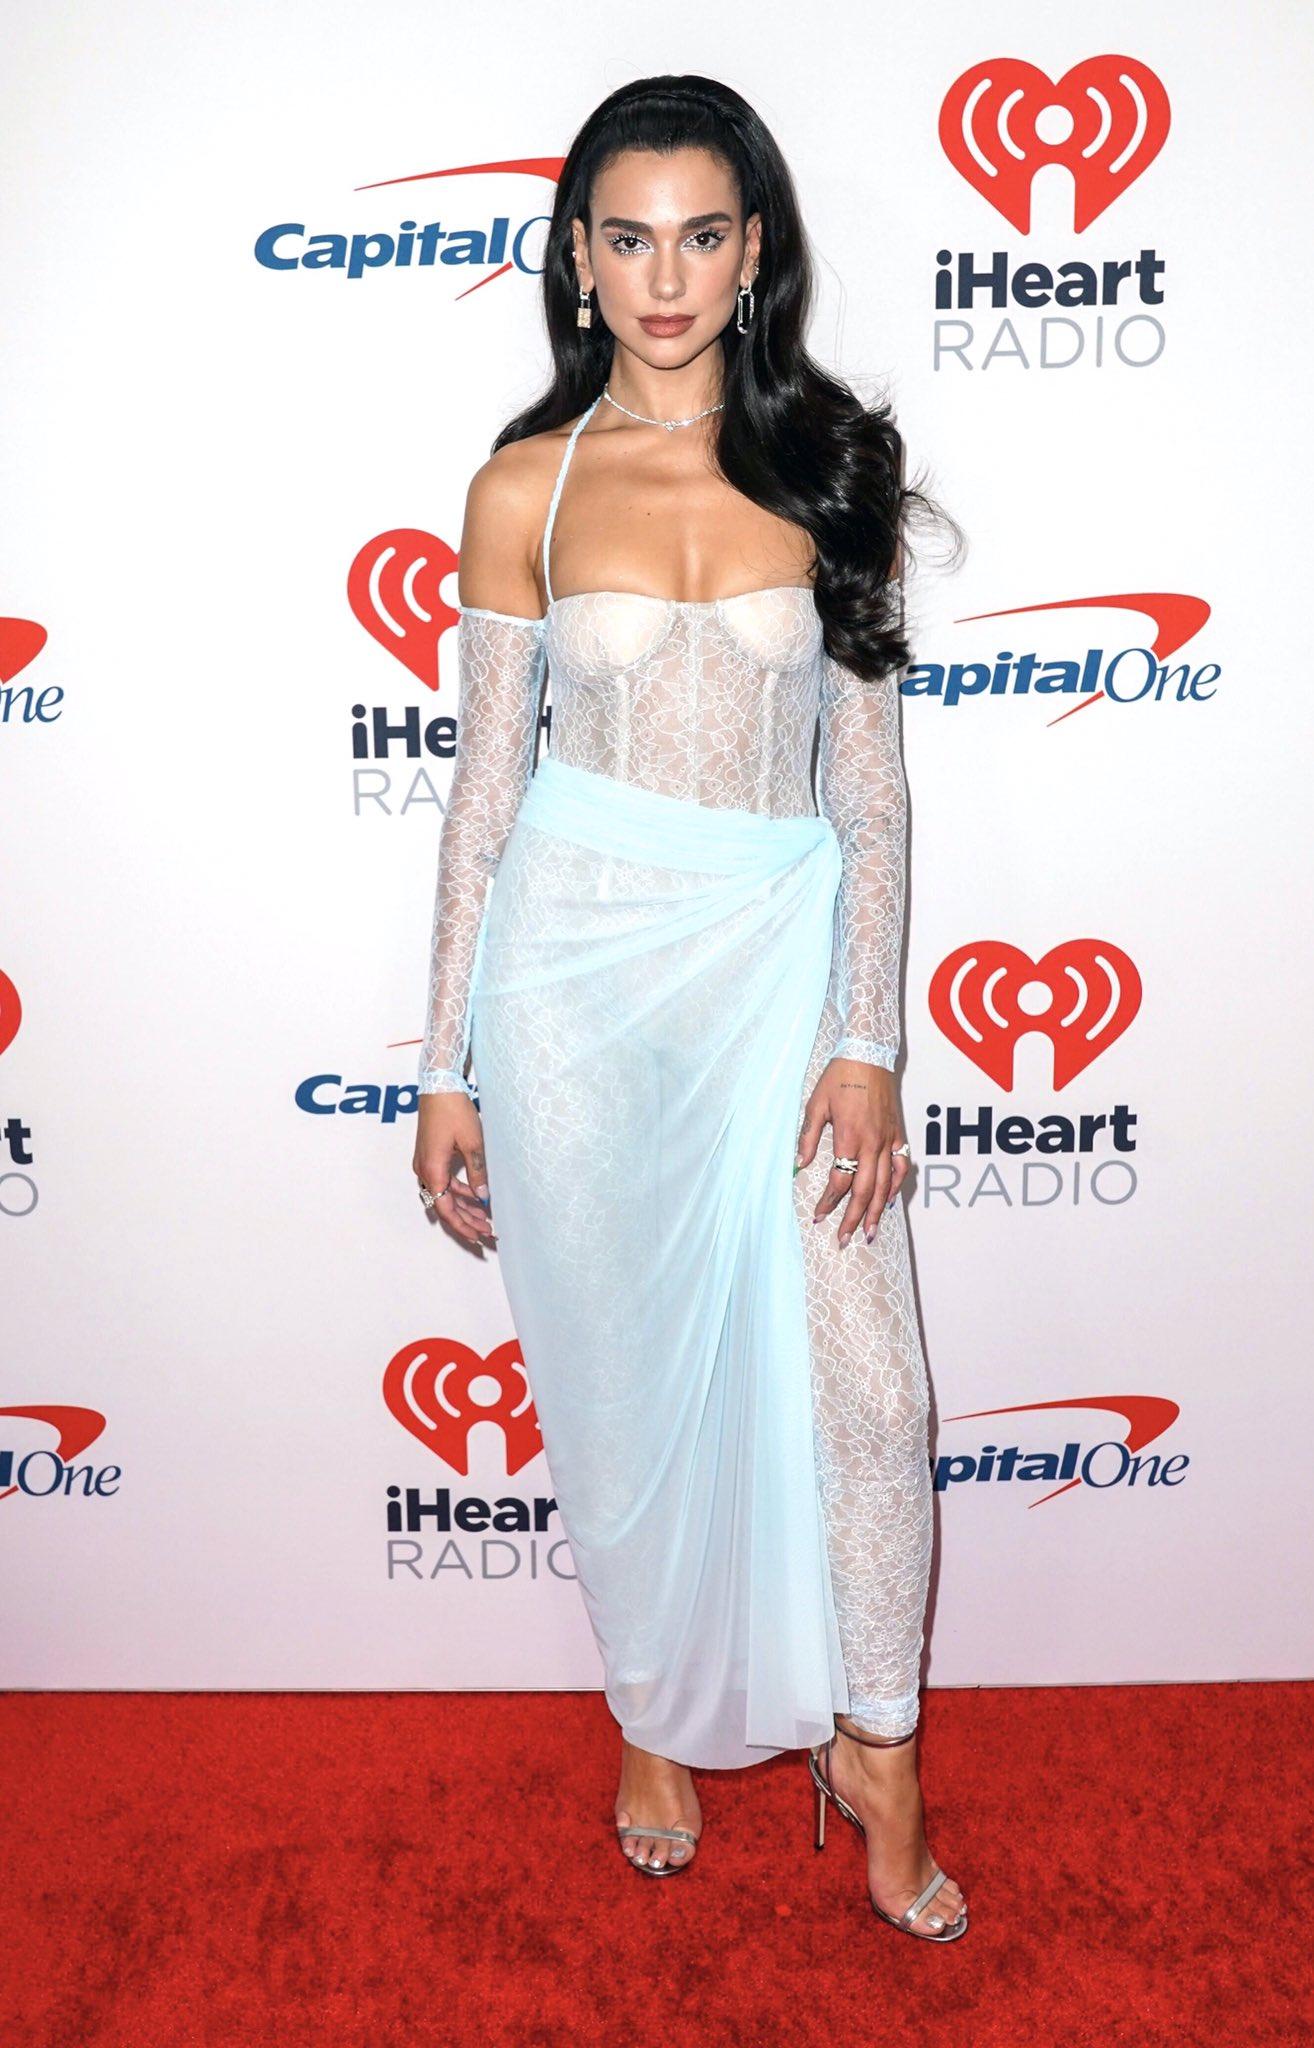 Dua Lipa's Lace Catsuit at iHeartRadio Music Festival 2021